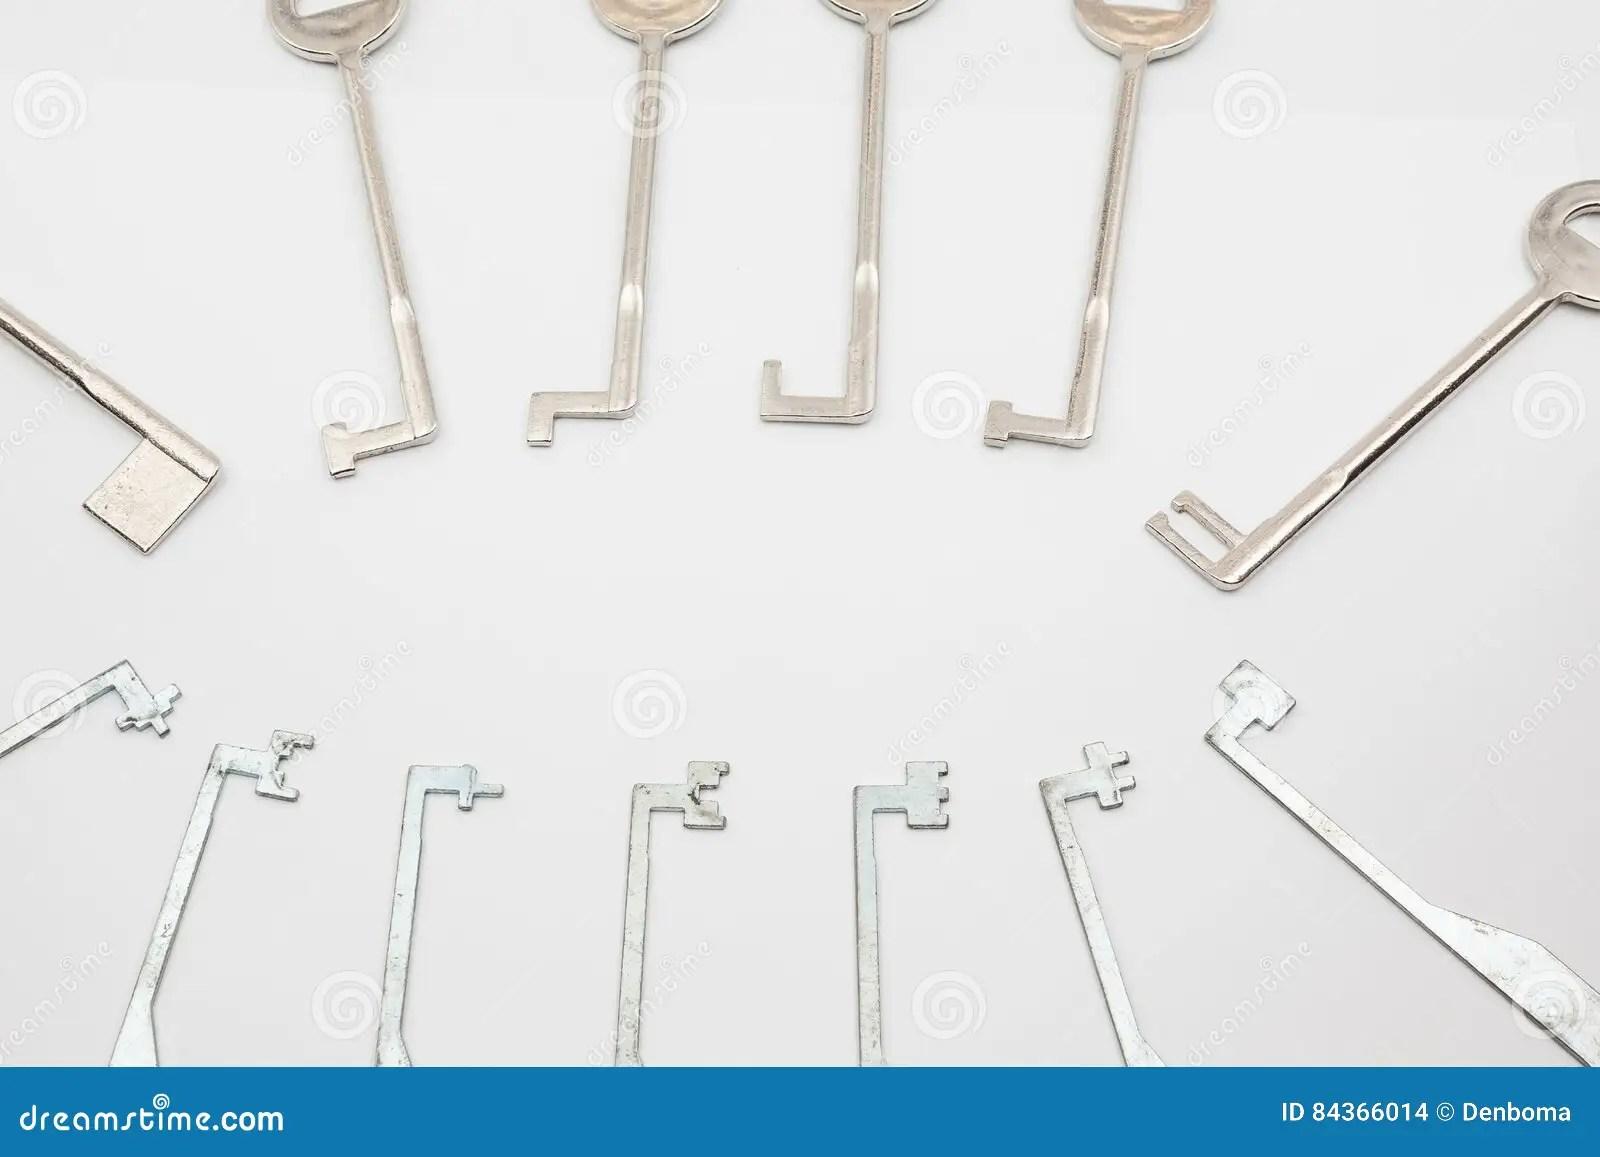 hight resolution of an lock pick